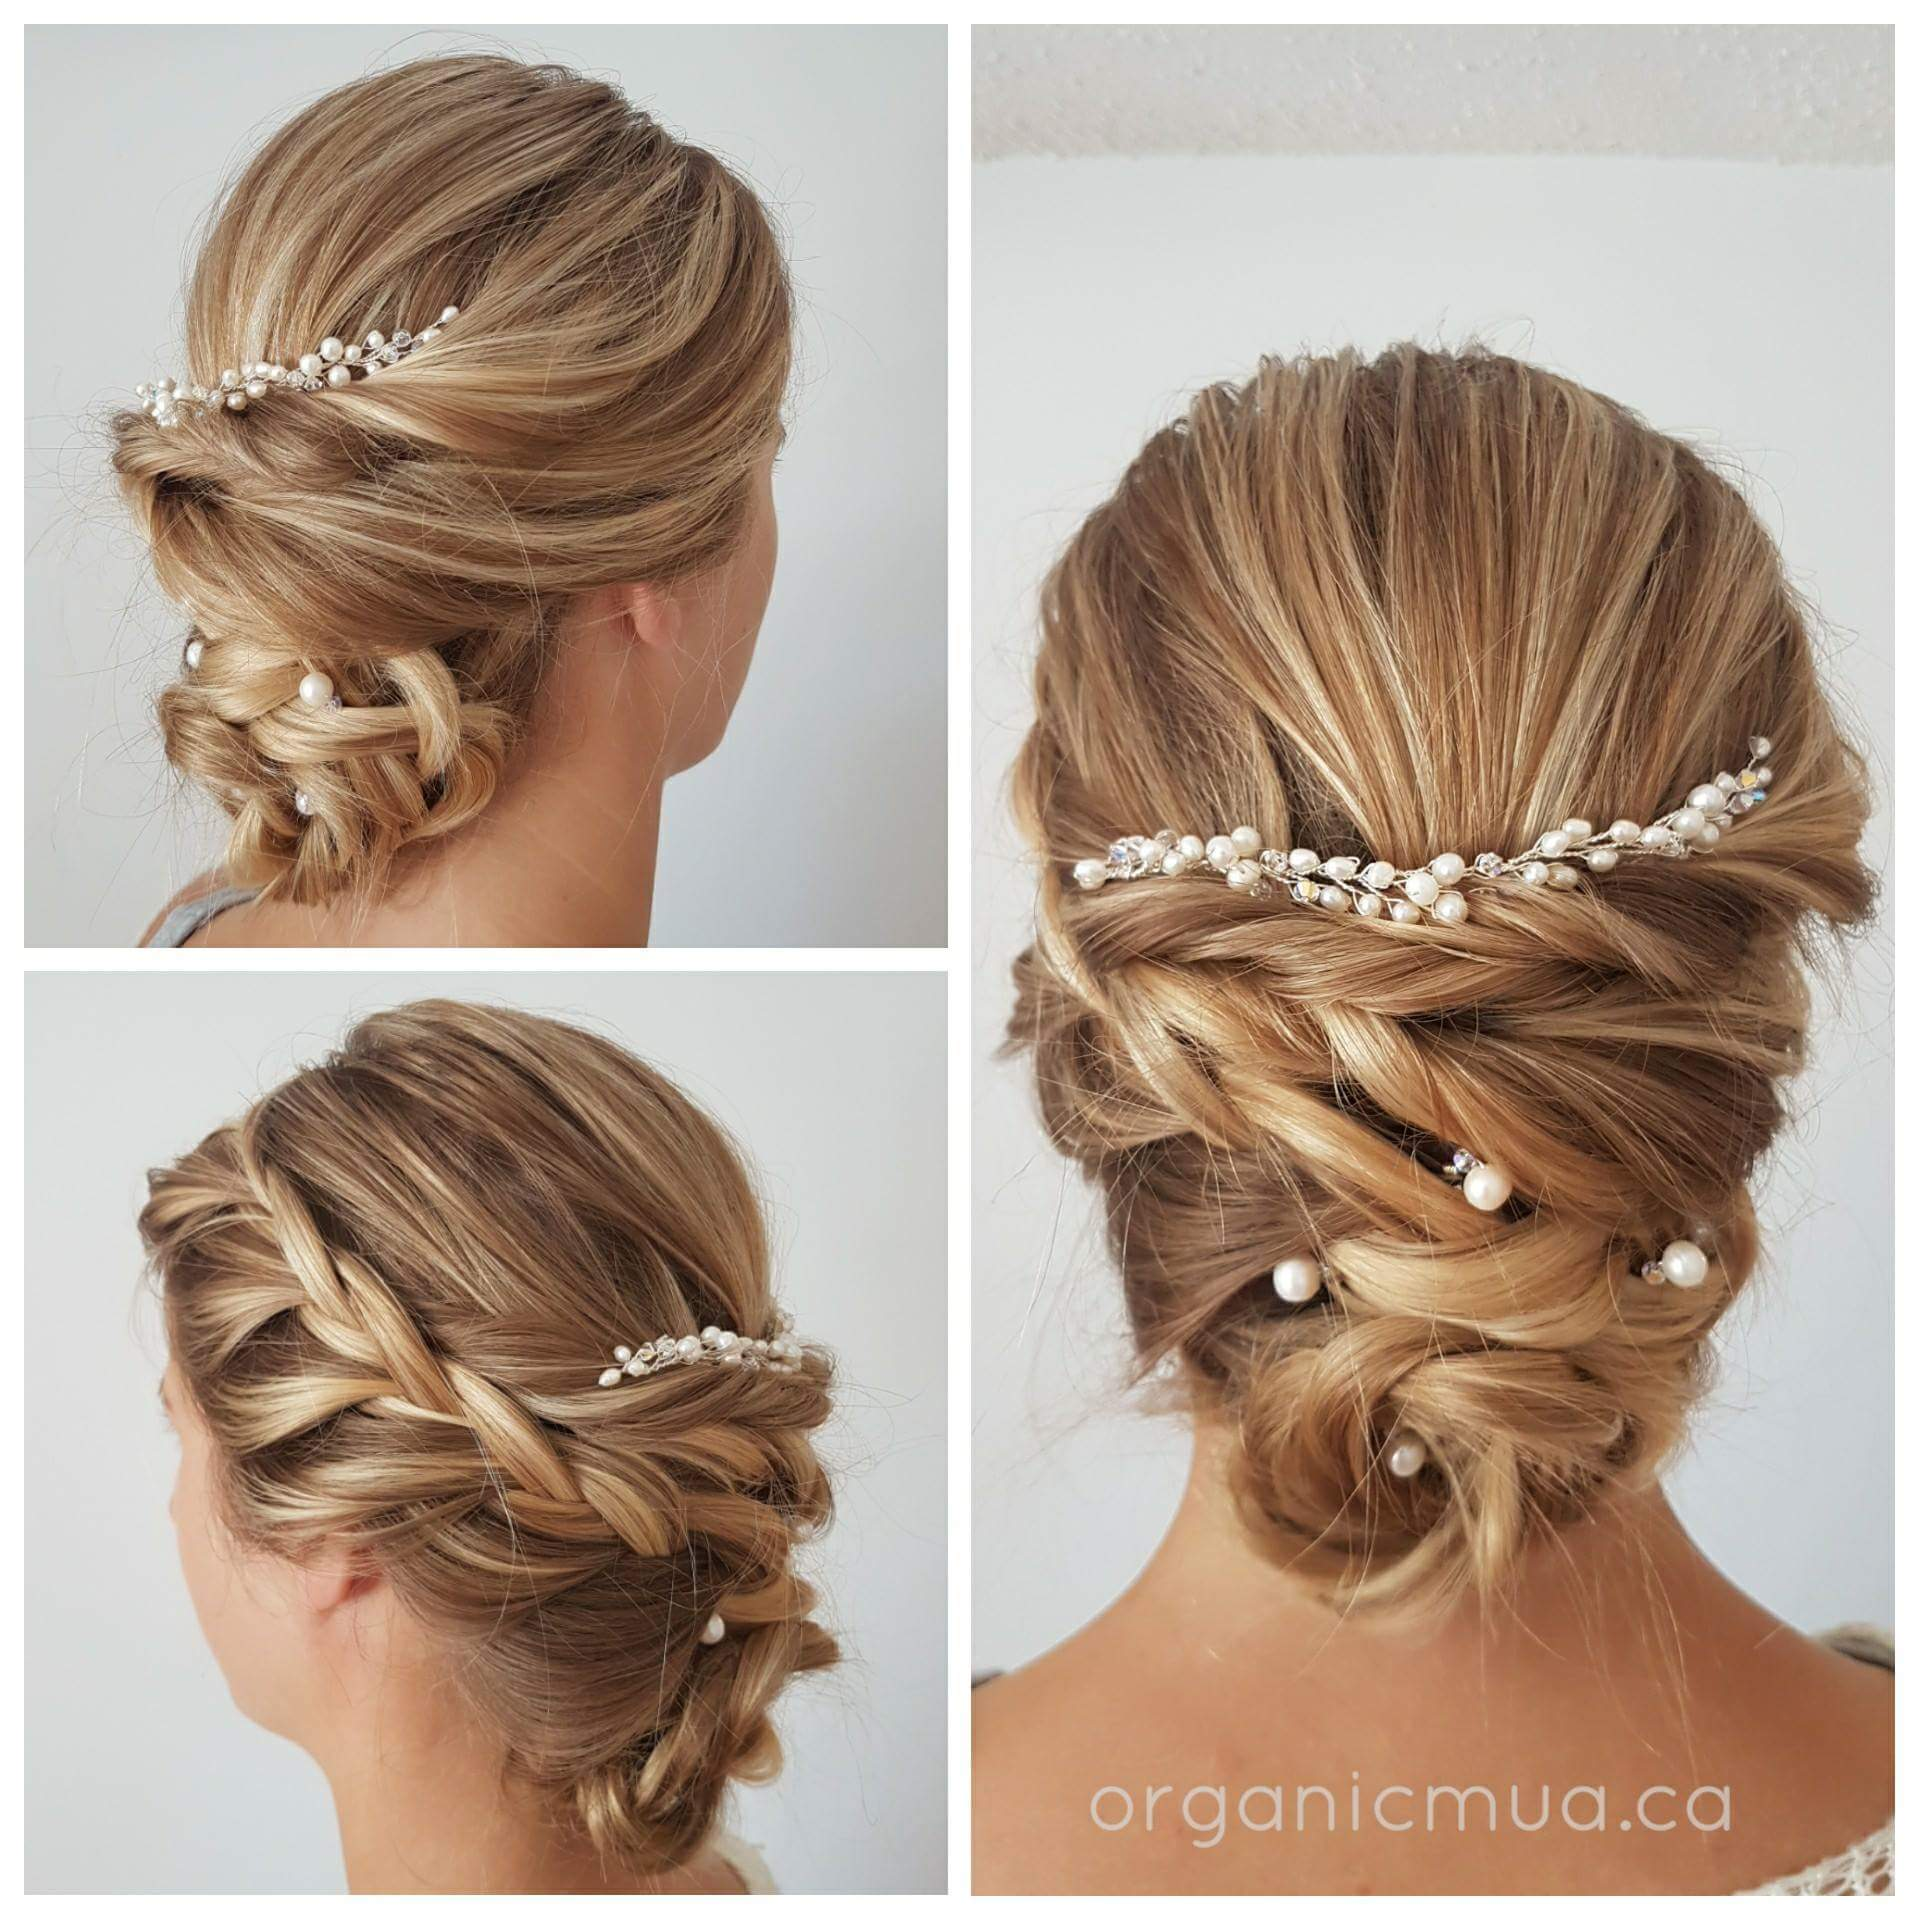 wedding updo blonde hair with hair jewelry by West Coast Jewelry